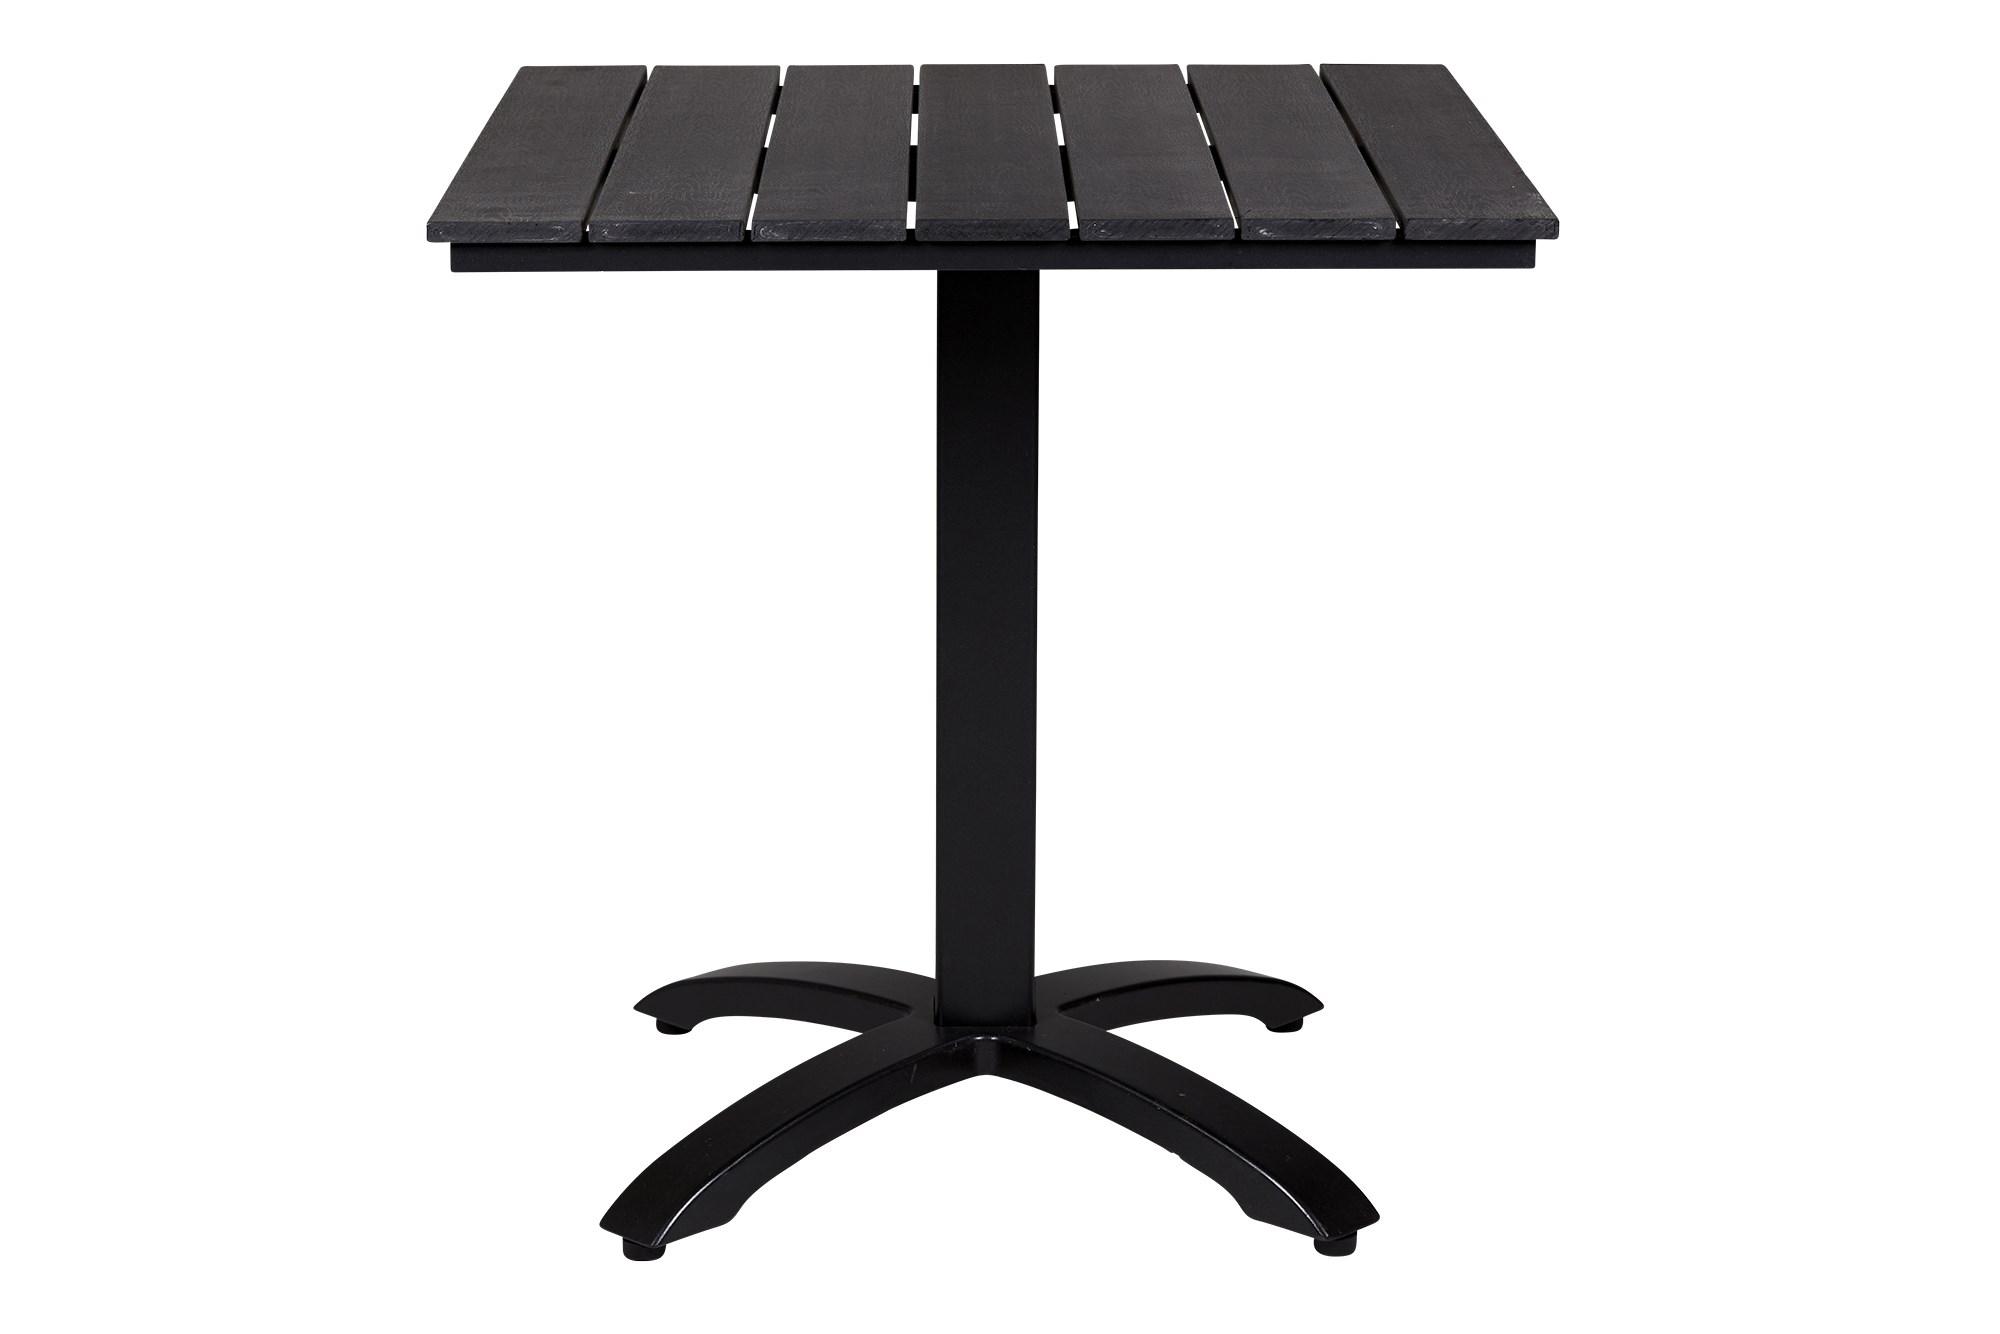 Køb Anzio Sort Nonwood Cafebord 70×70 Cm Med Sort Aluminium Stel